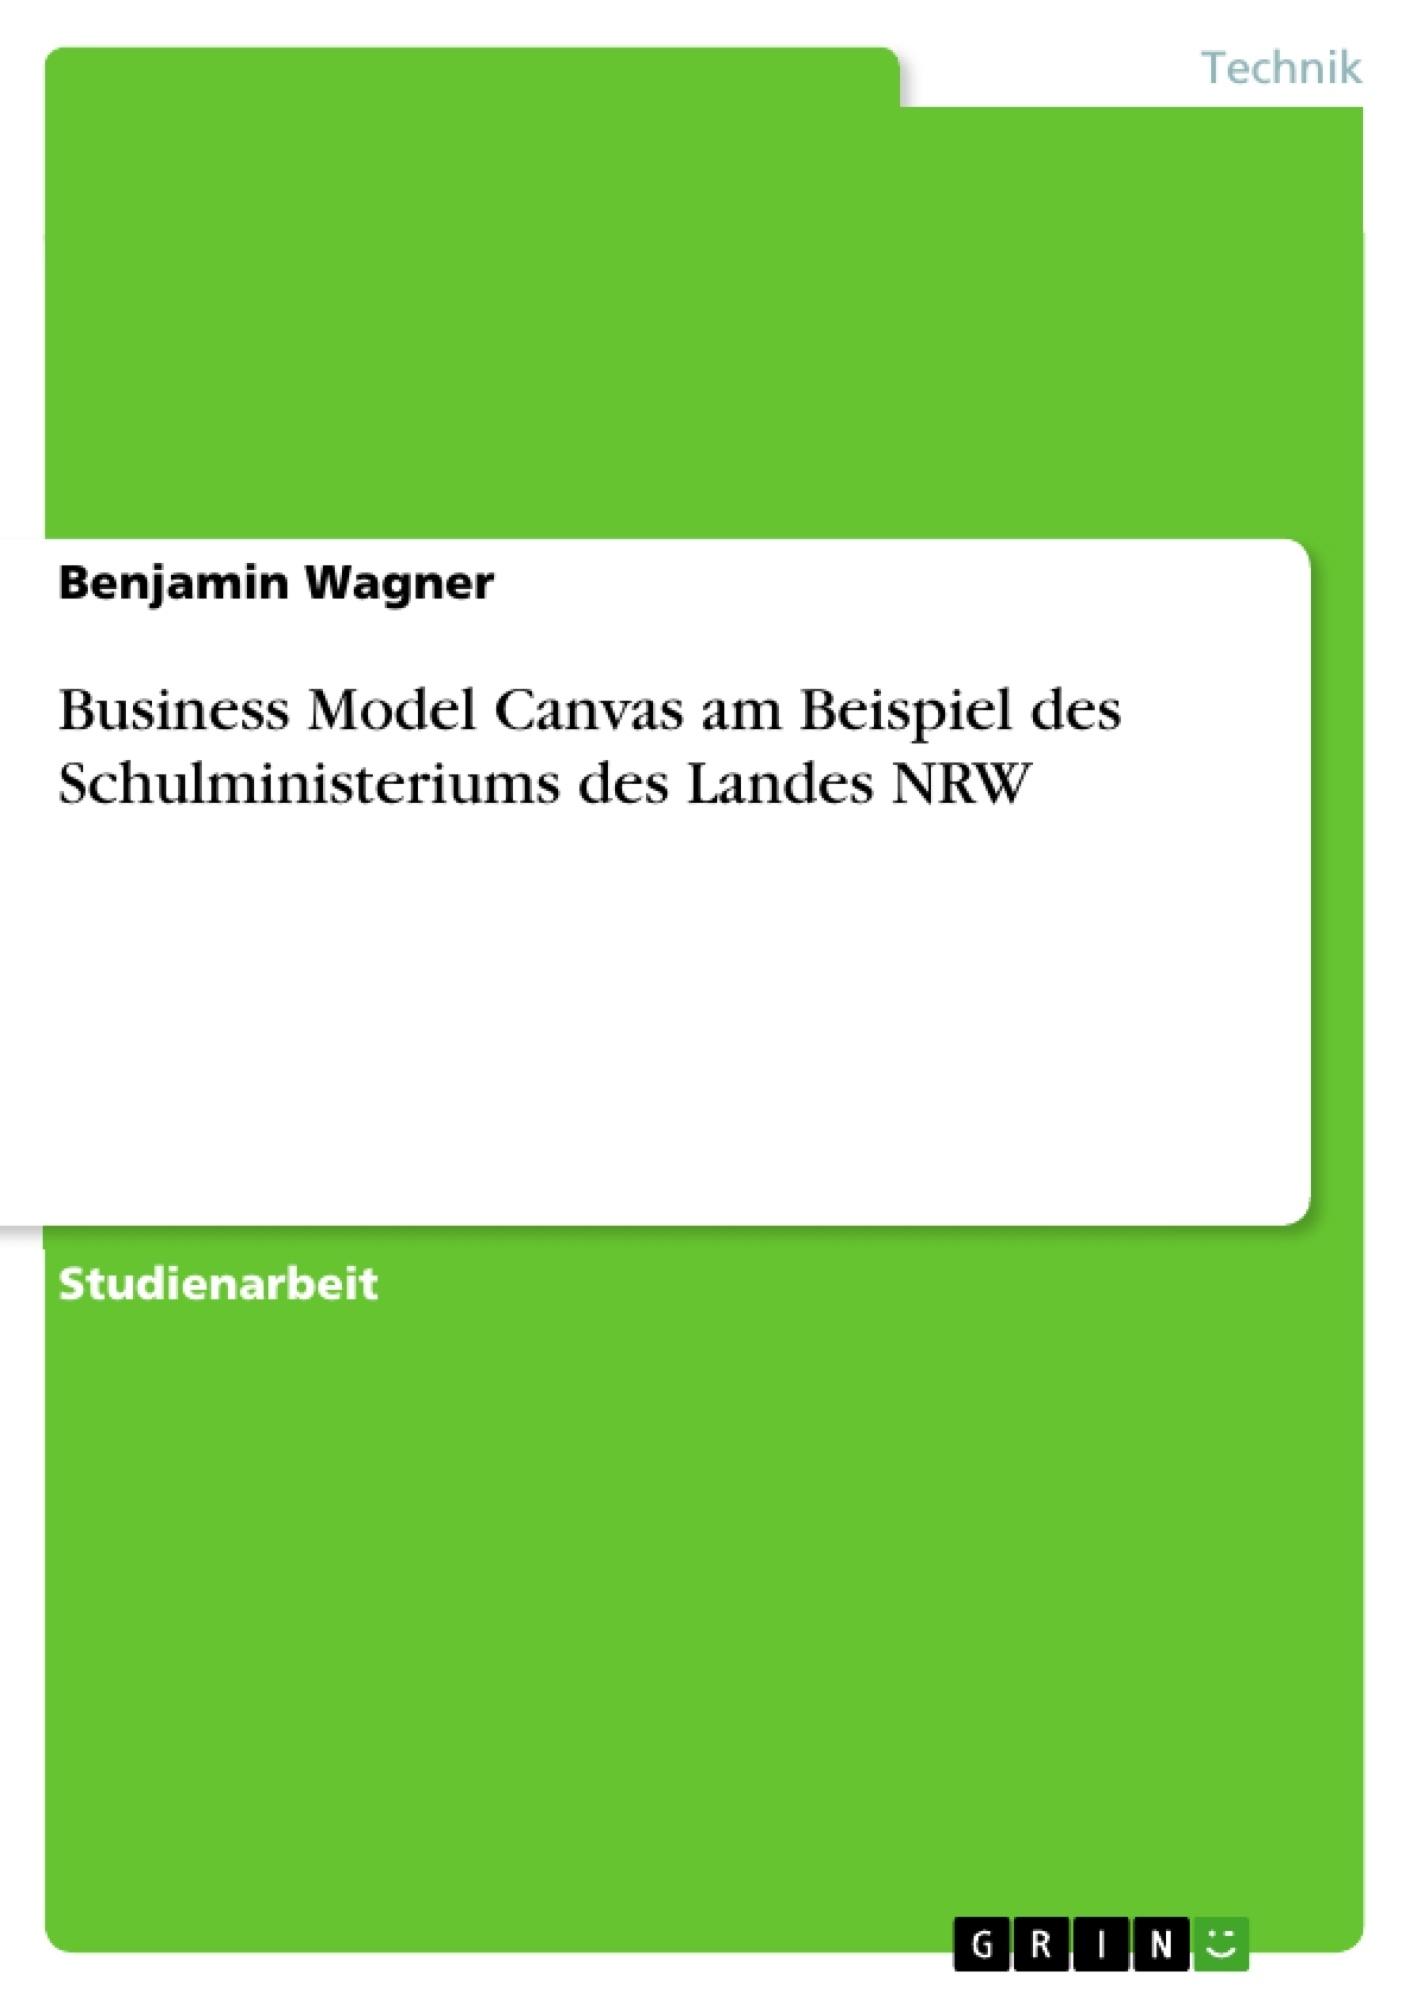 Titel: Business Model Canvas am Beispiel des Schulministeriums des Landes NRW